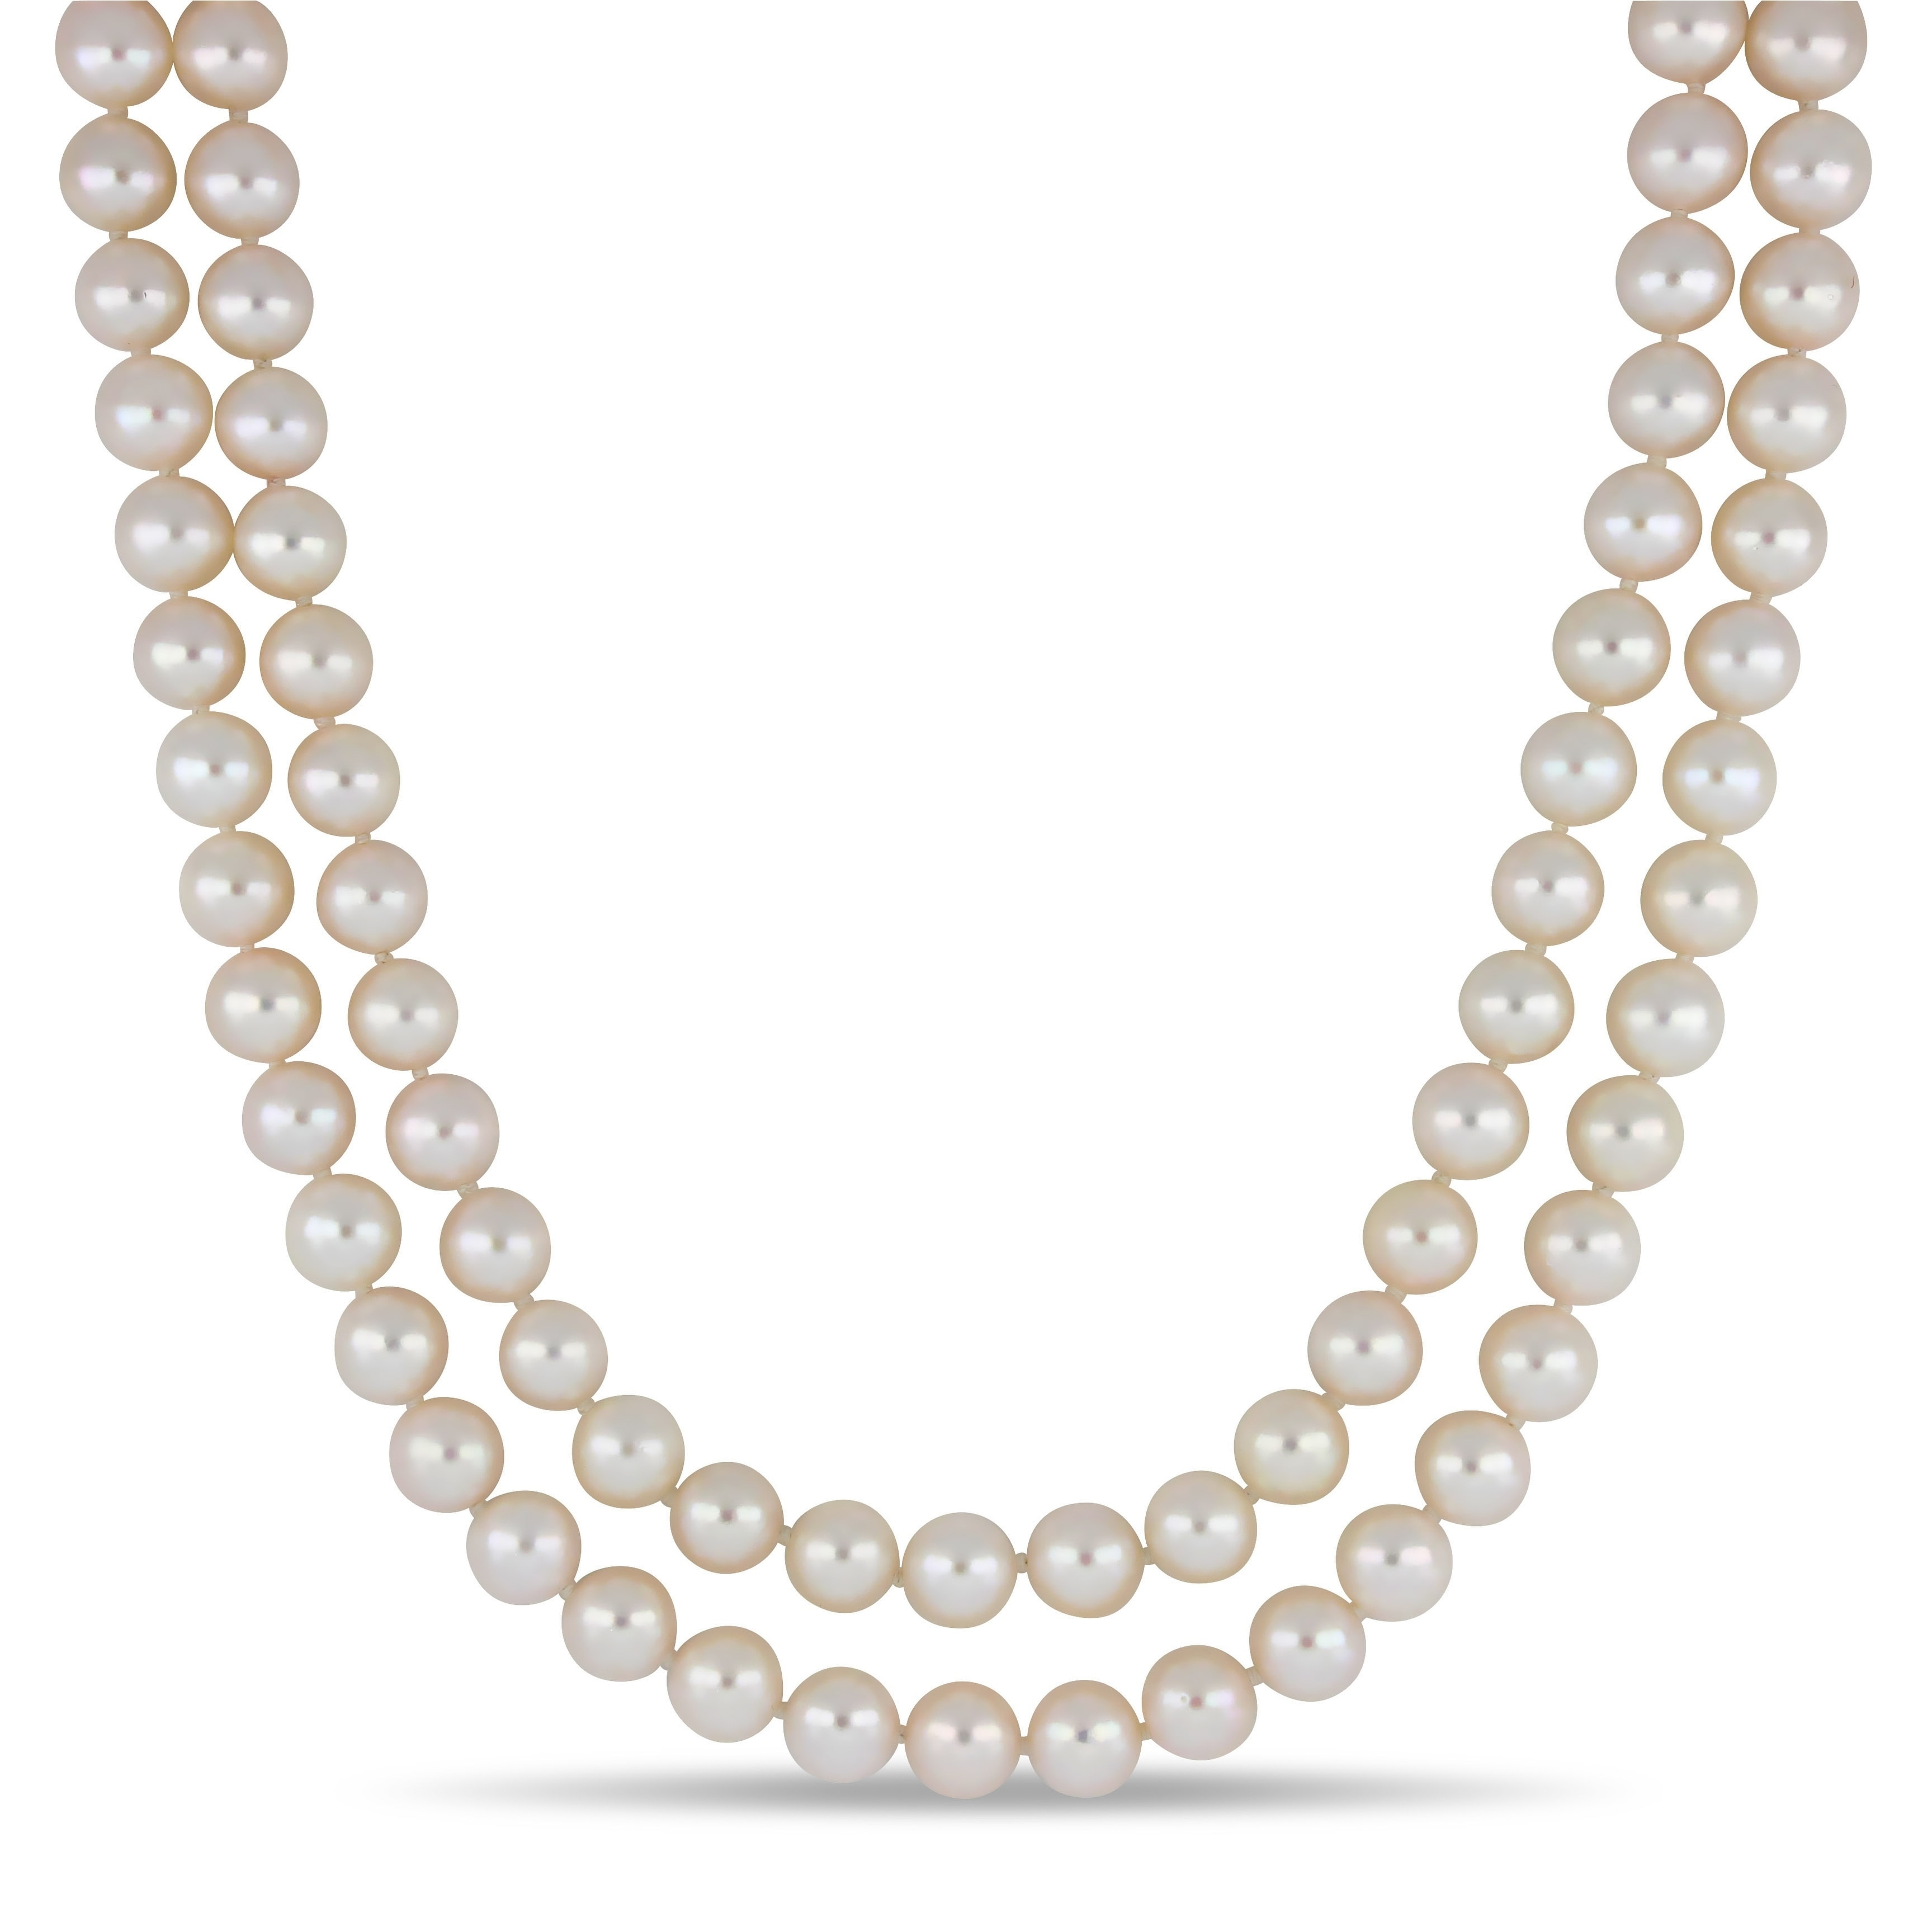 Pearl Pendant 14k White Gold Necklace 8-8.5mm White Japanese Akoya